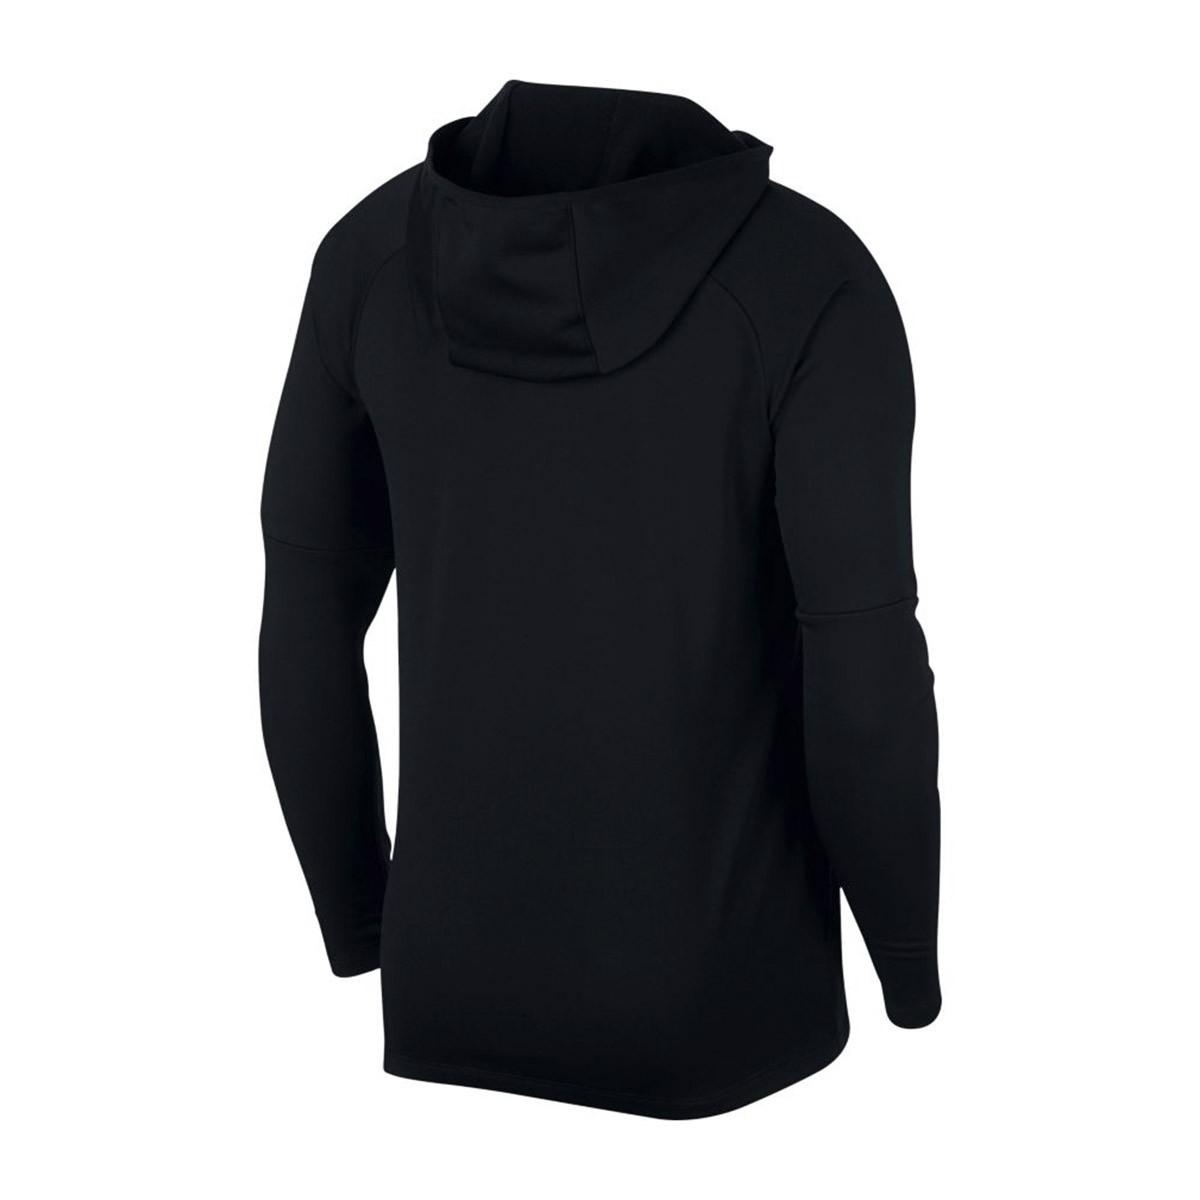 cfc899652 Sweatshirt Nike Dry Academy Hoodie Niño Black - Tienda de fútbol ...